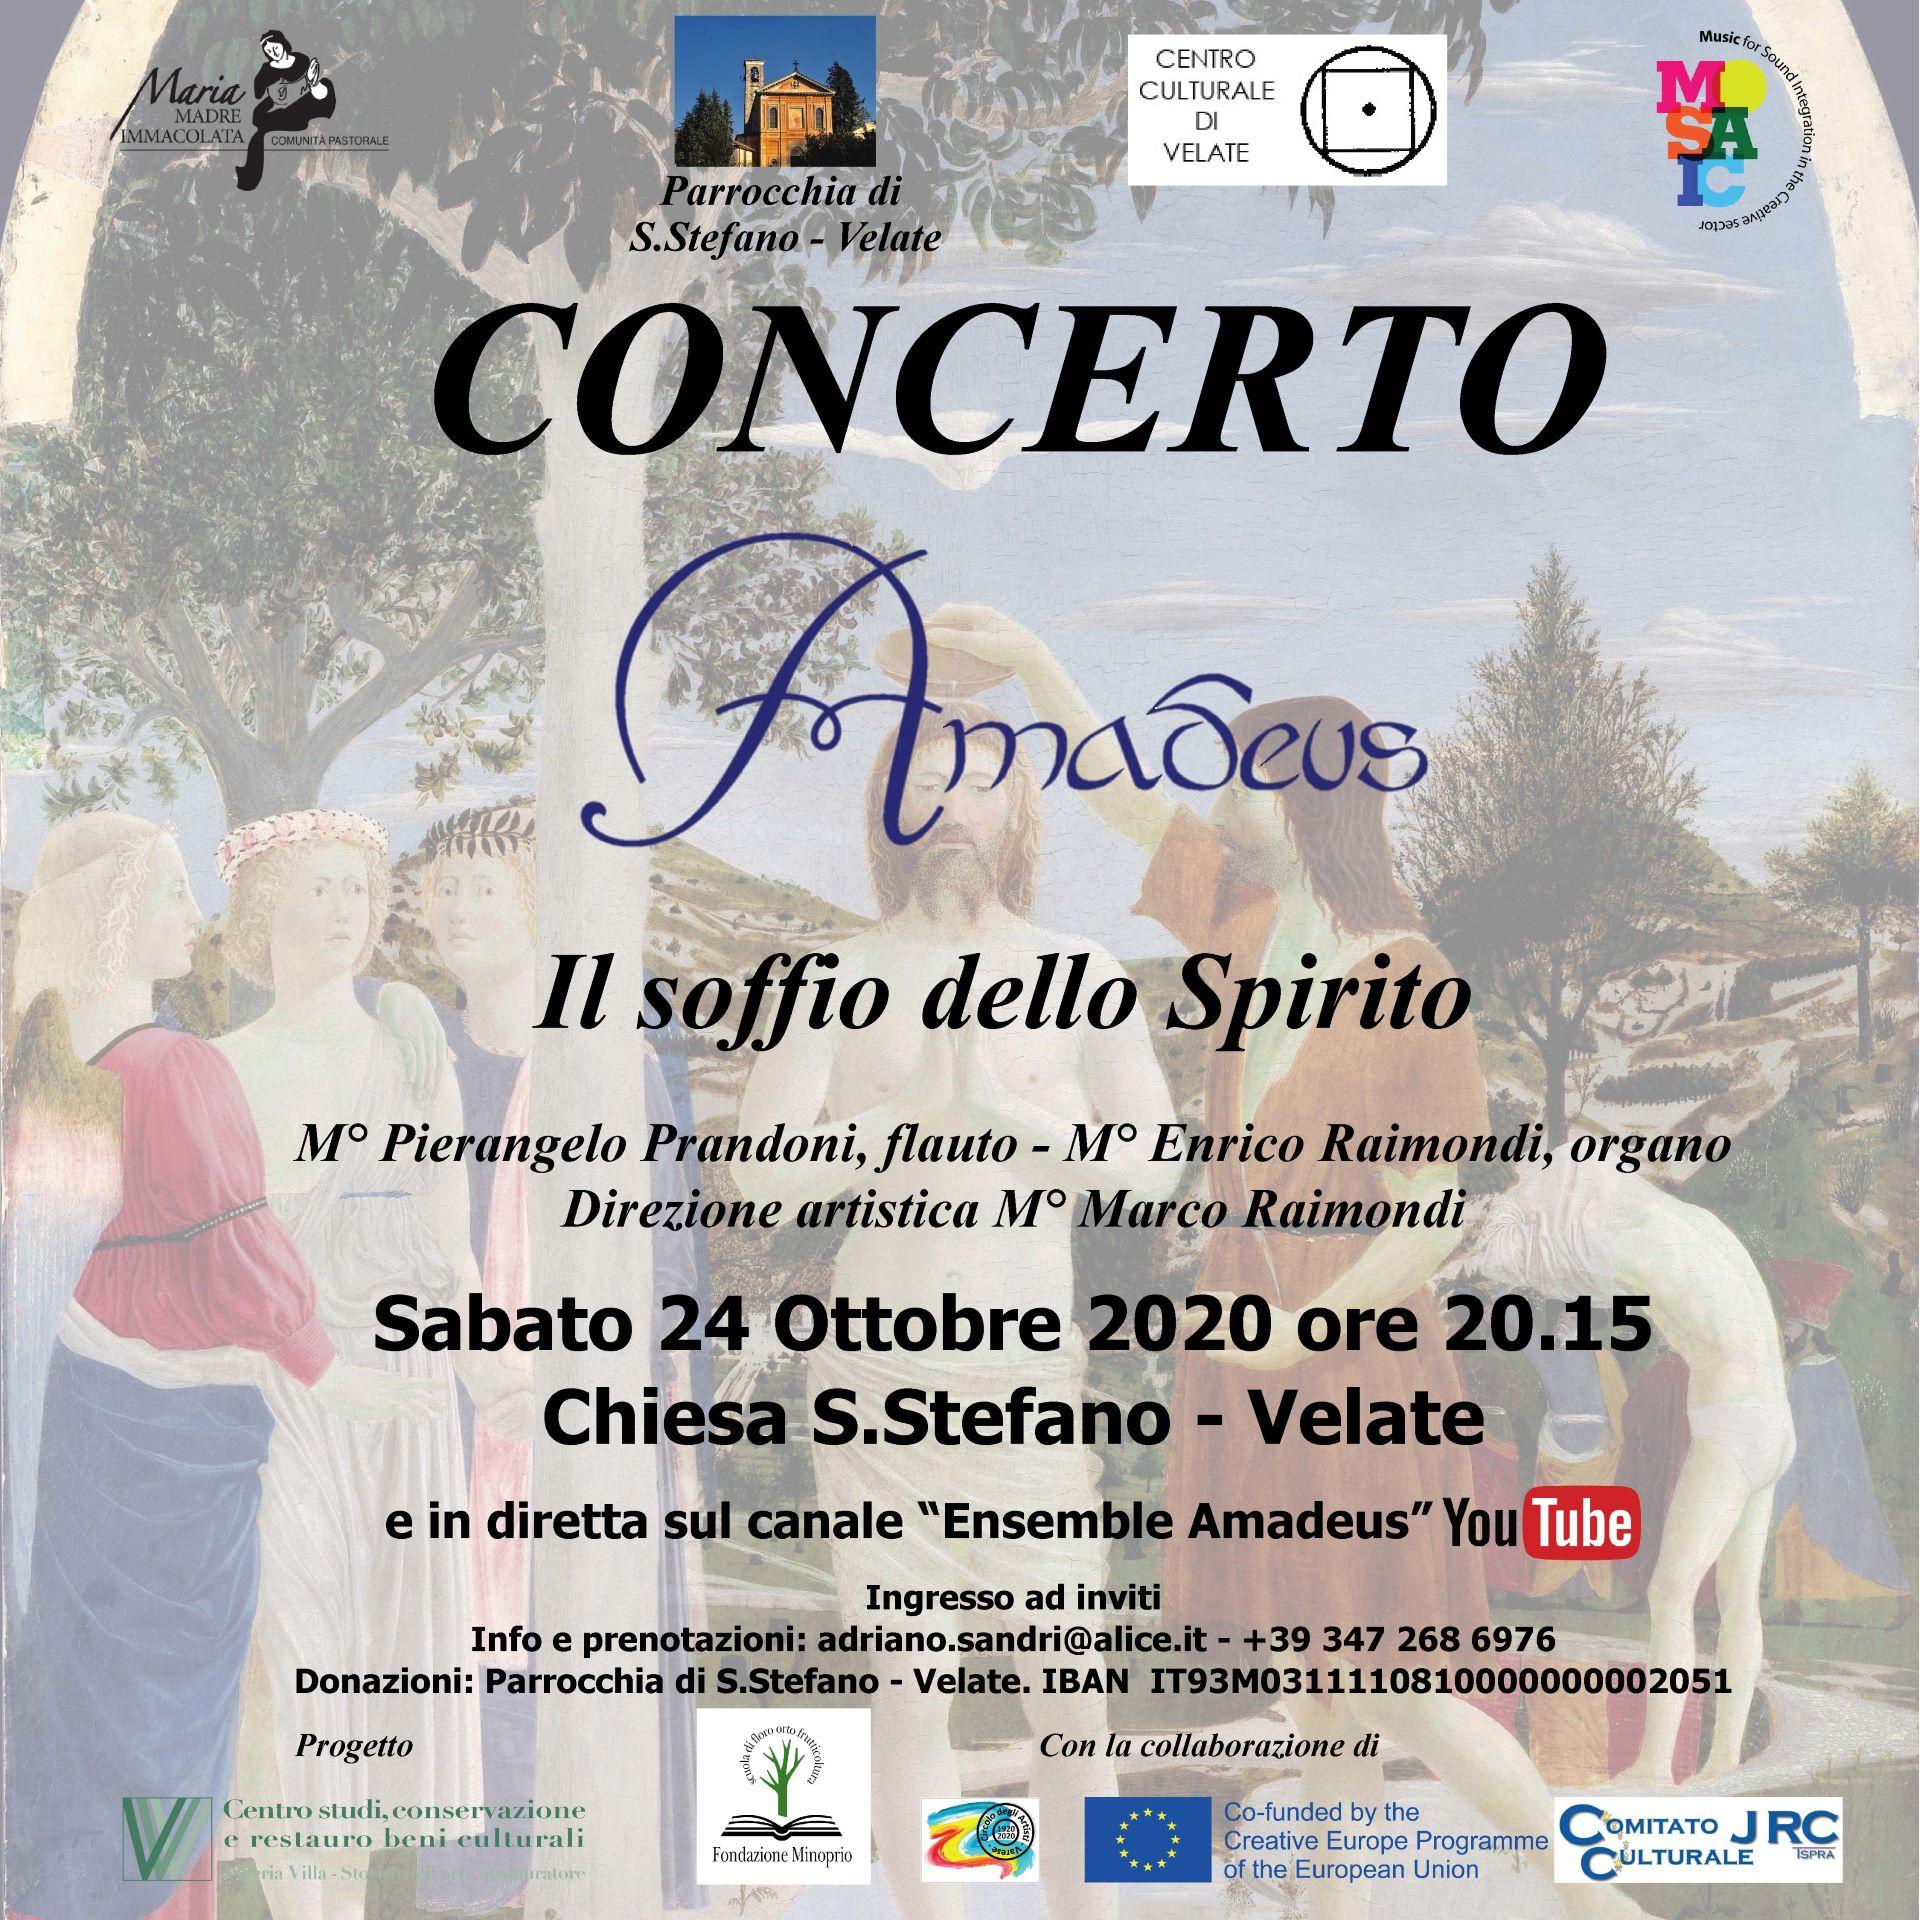 Concerto-Amadeus-24-ottobre-2020